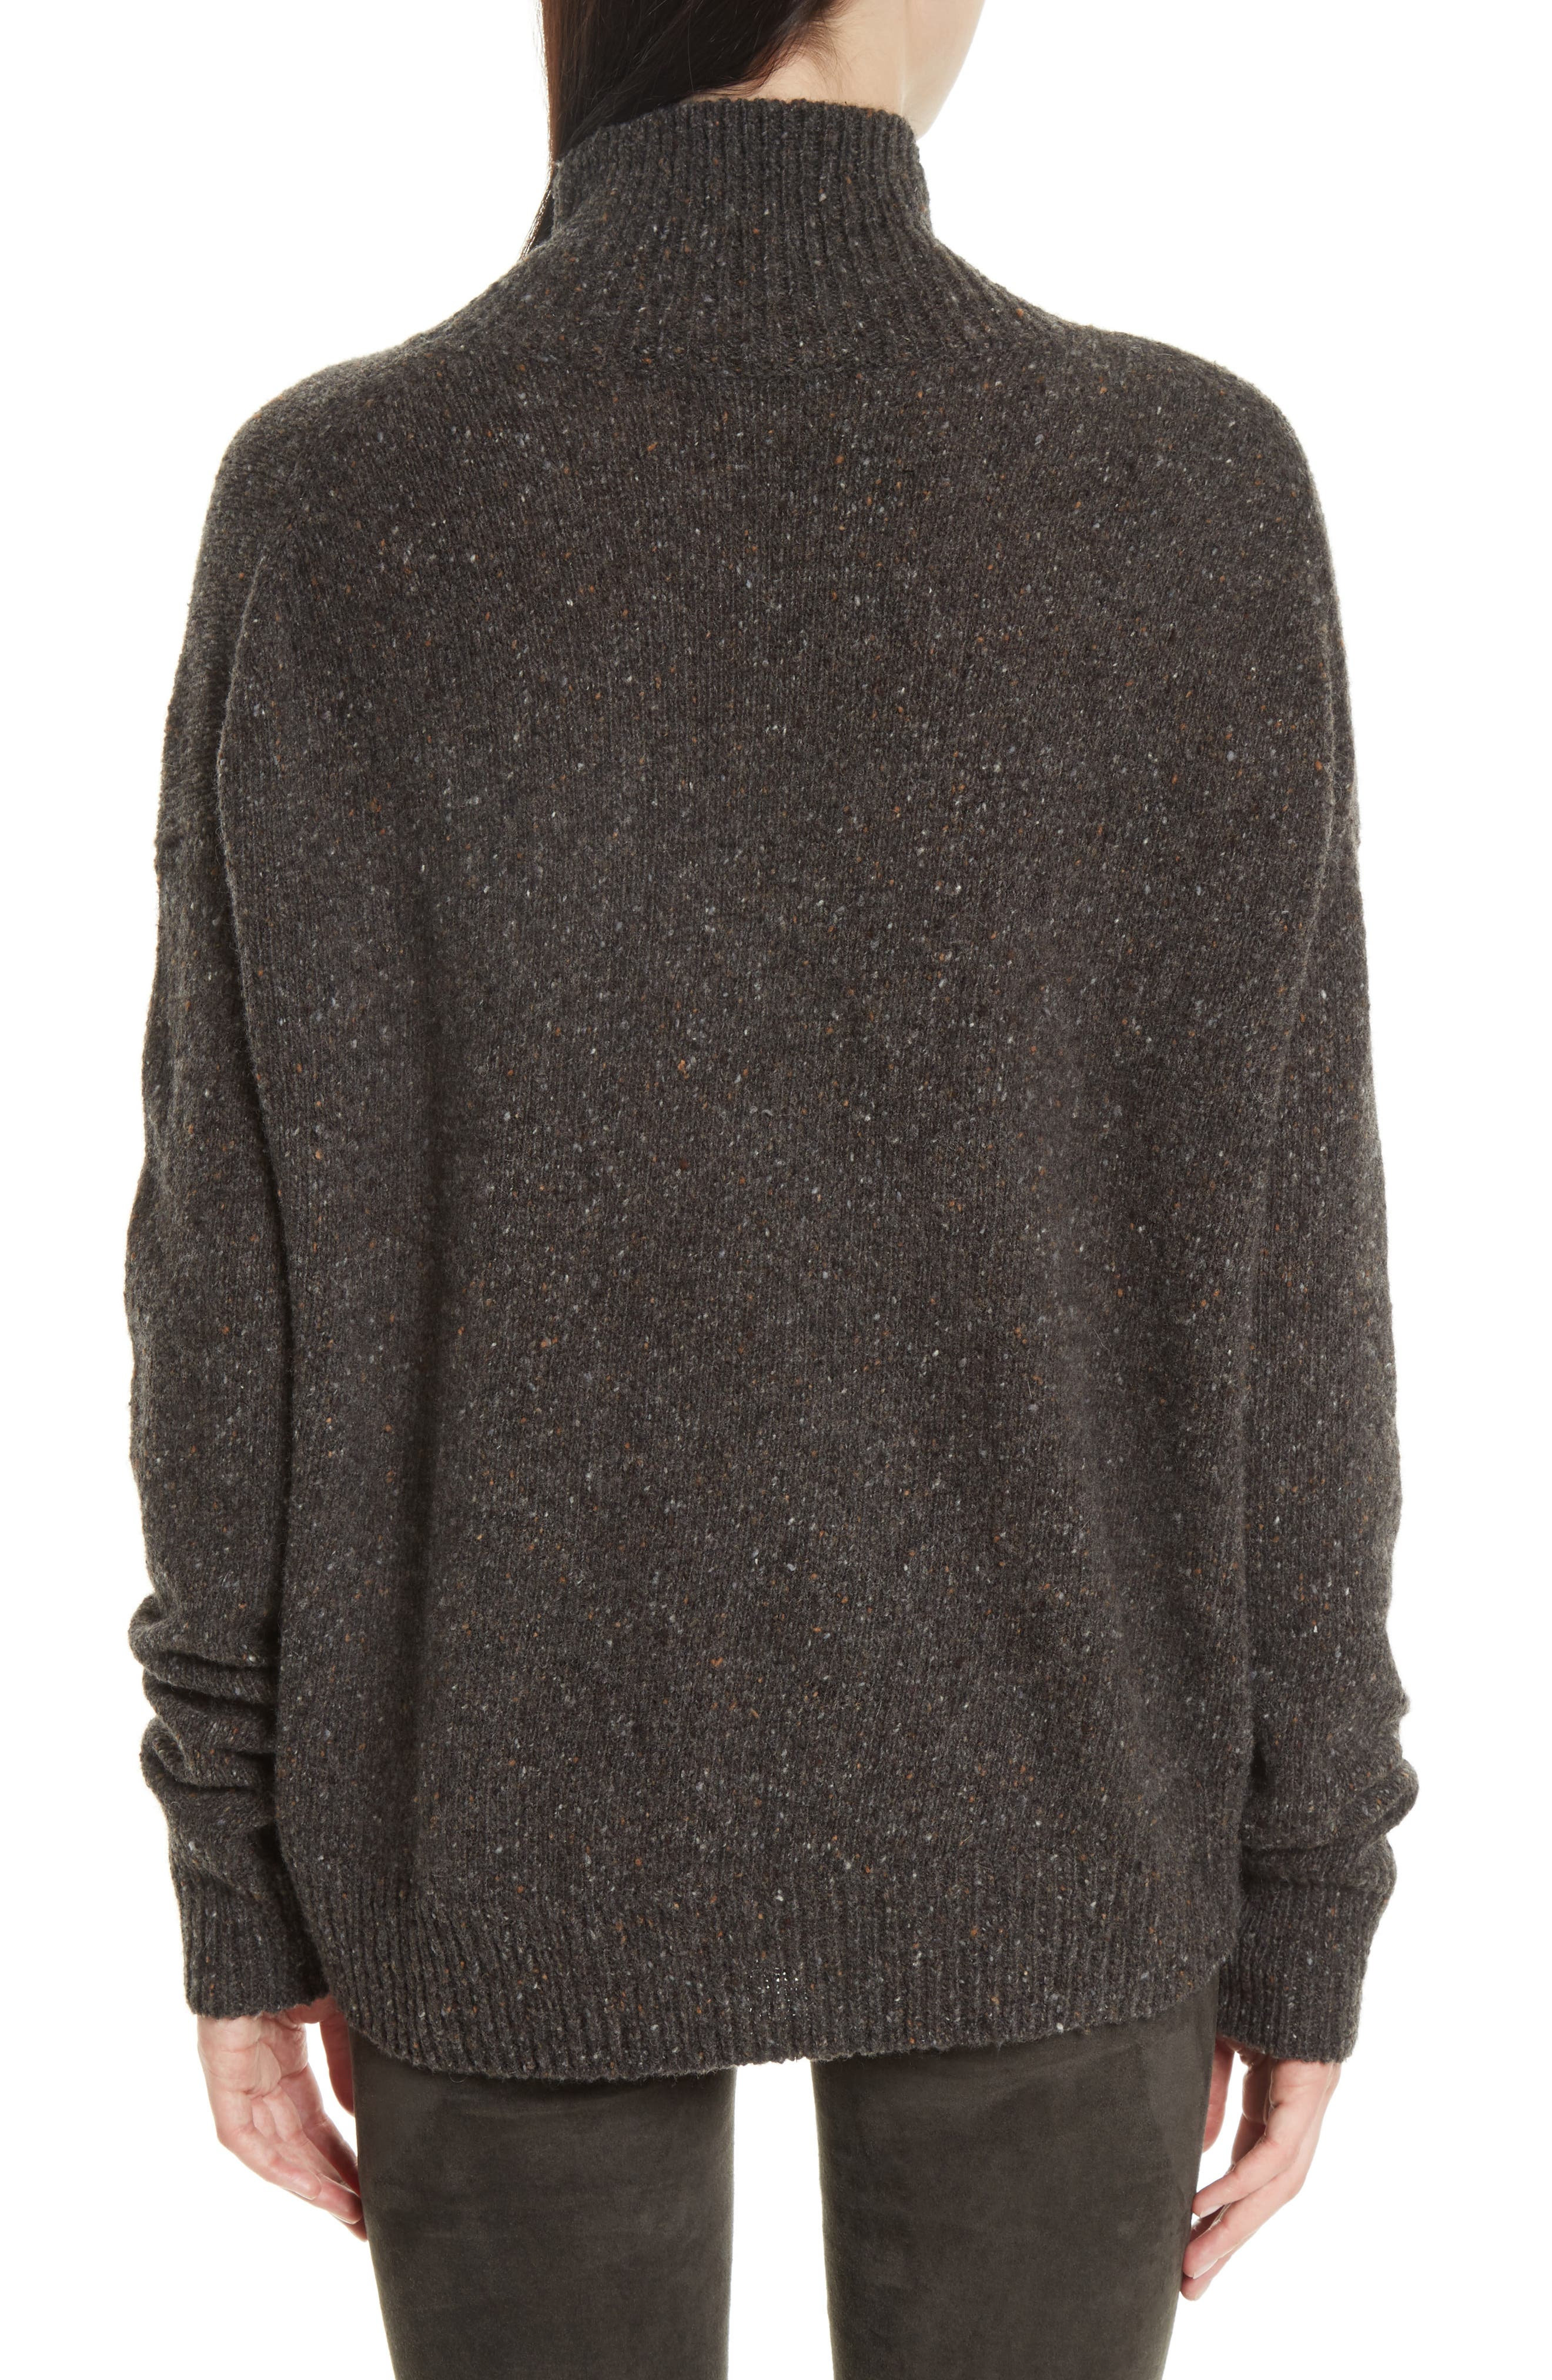 Cashmere Turtleneck Sweater,                             Alternate thumbnail 2, color,                             Charcoal